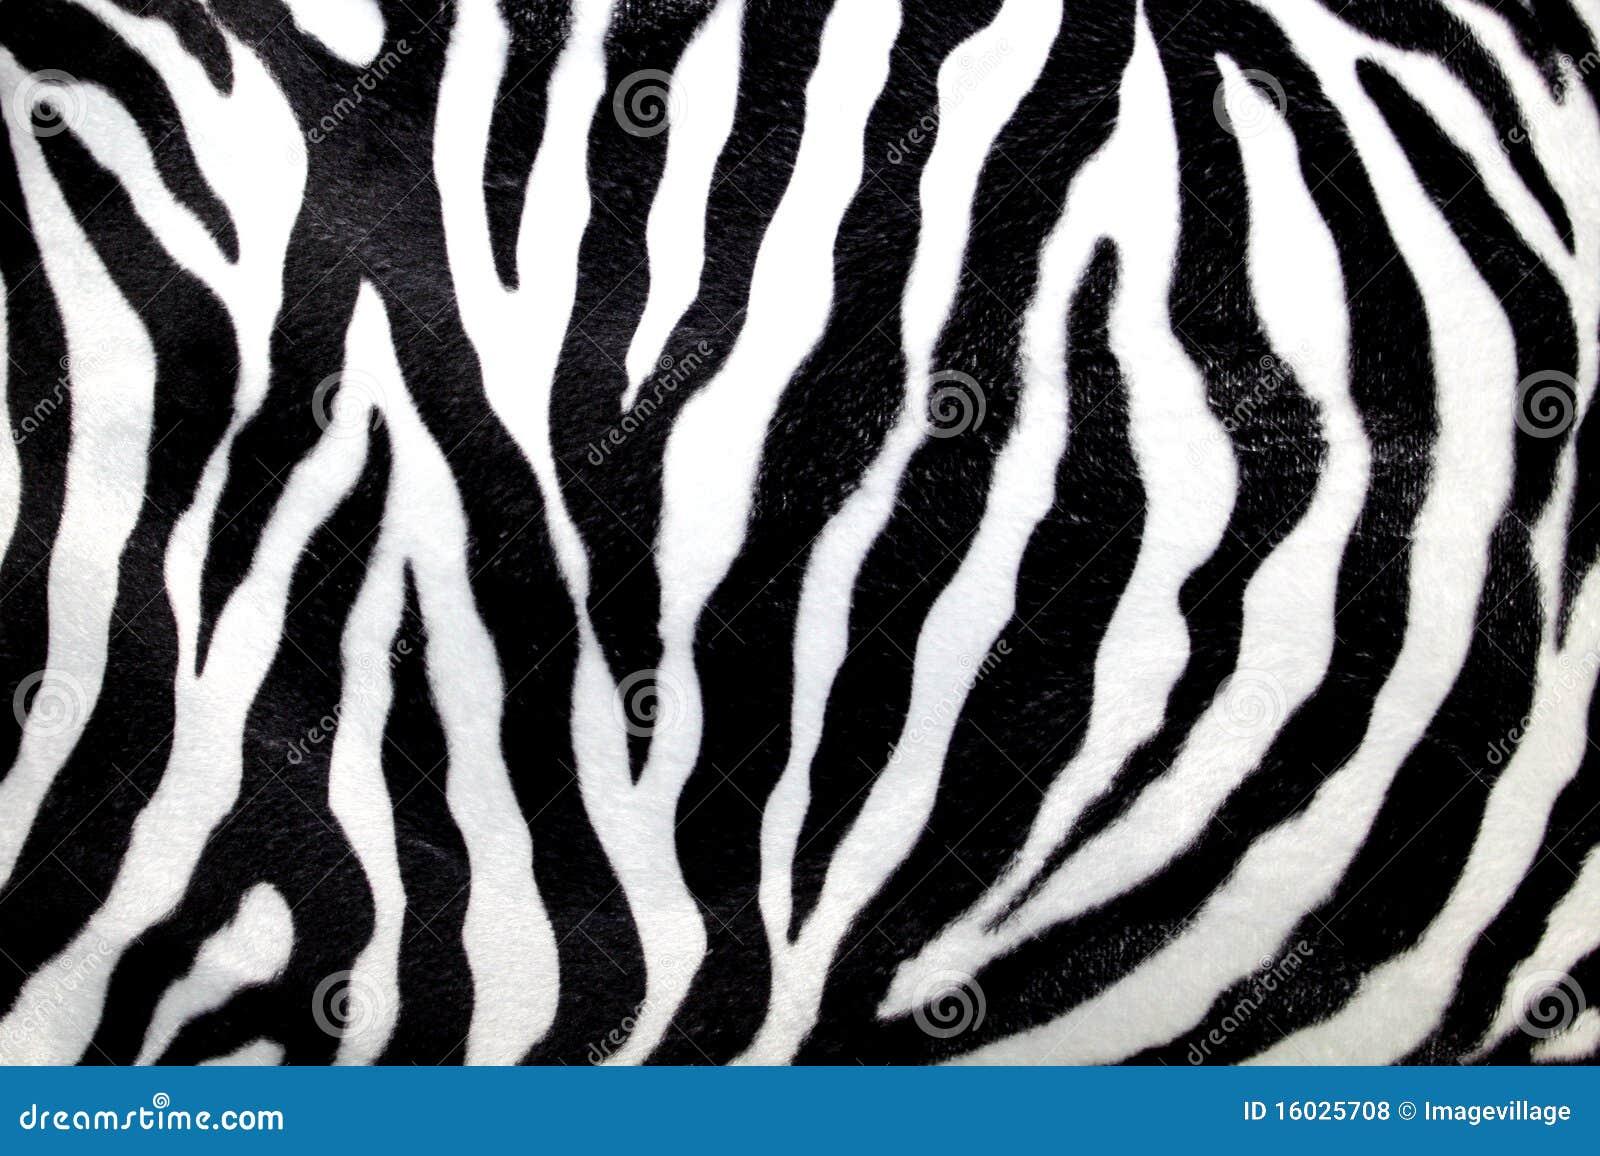 Zebra pattern stock photo image of element animal - Cuadros de cebras ...